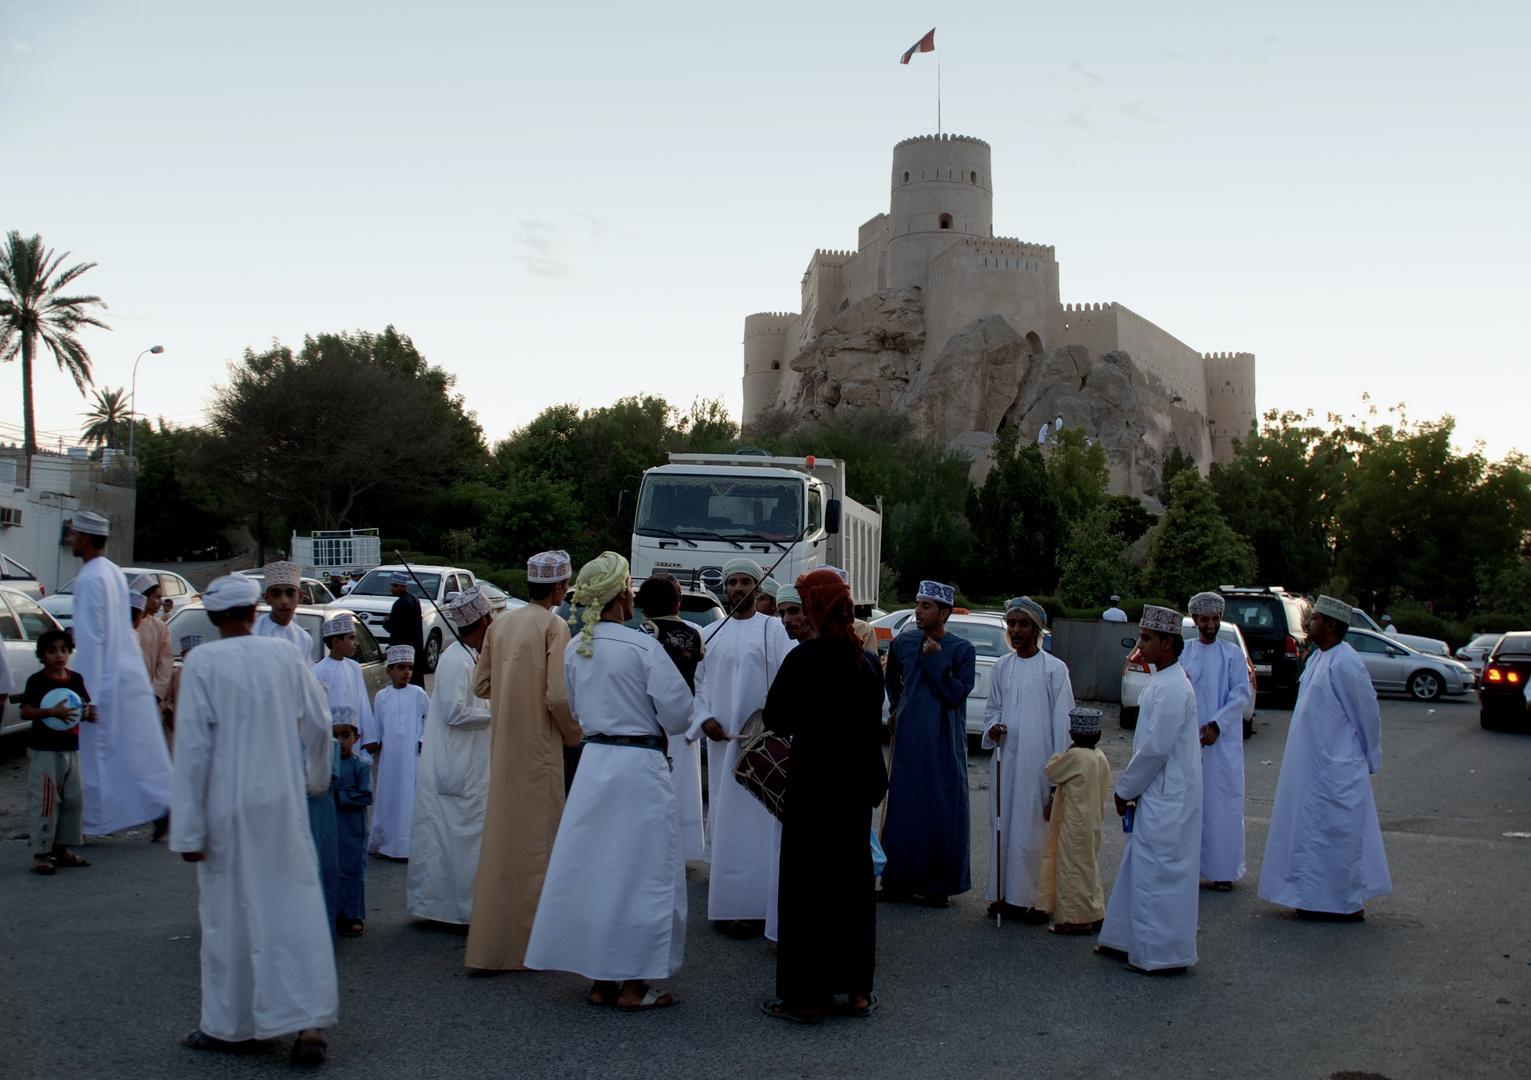 EID MUBARAK from Oman to all FotoCommunity friends